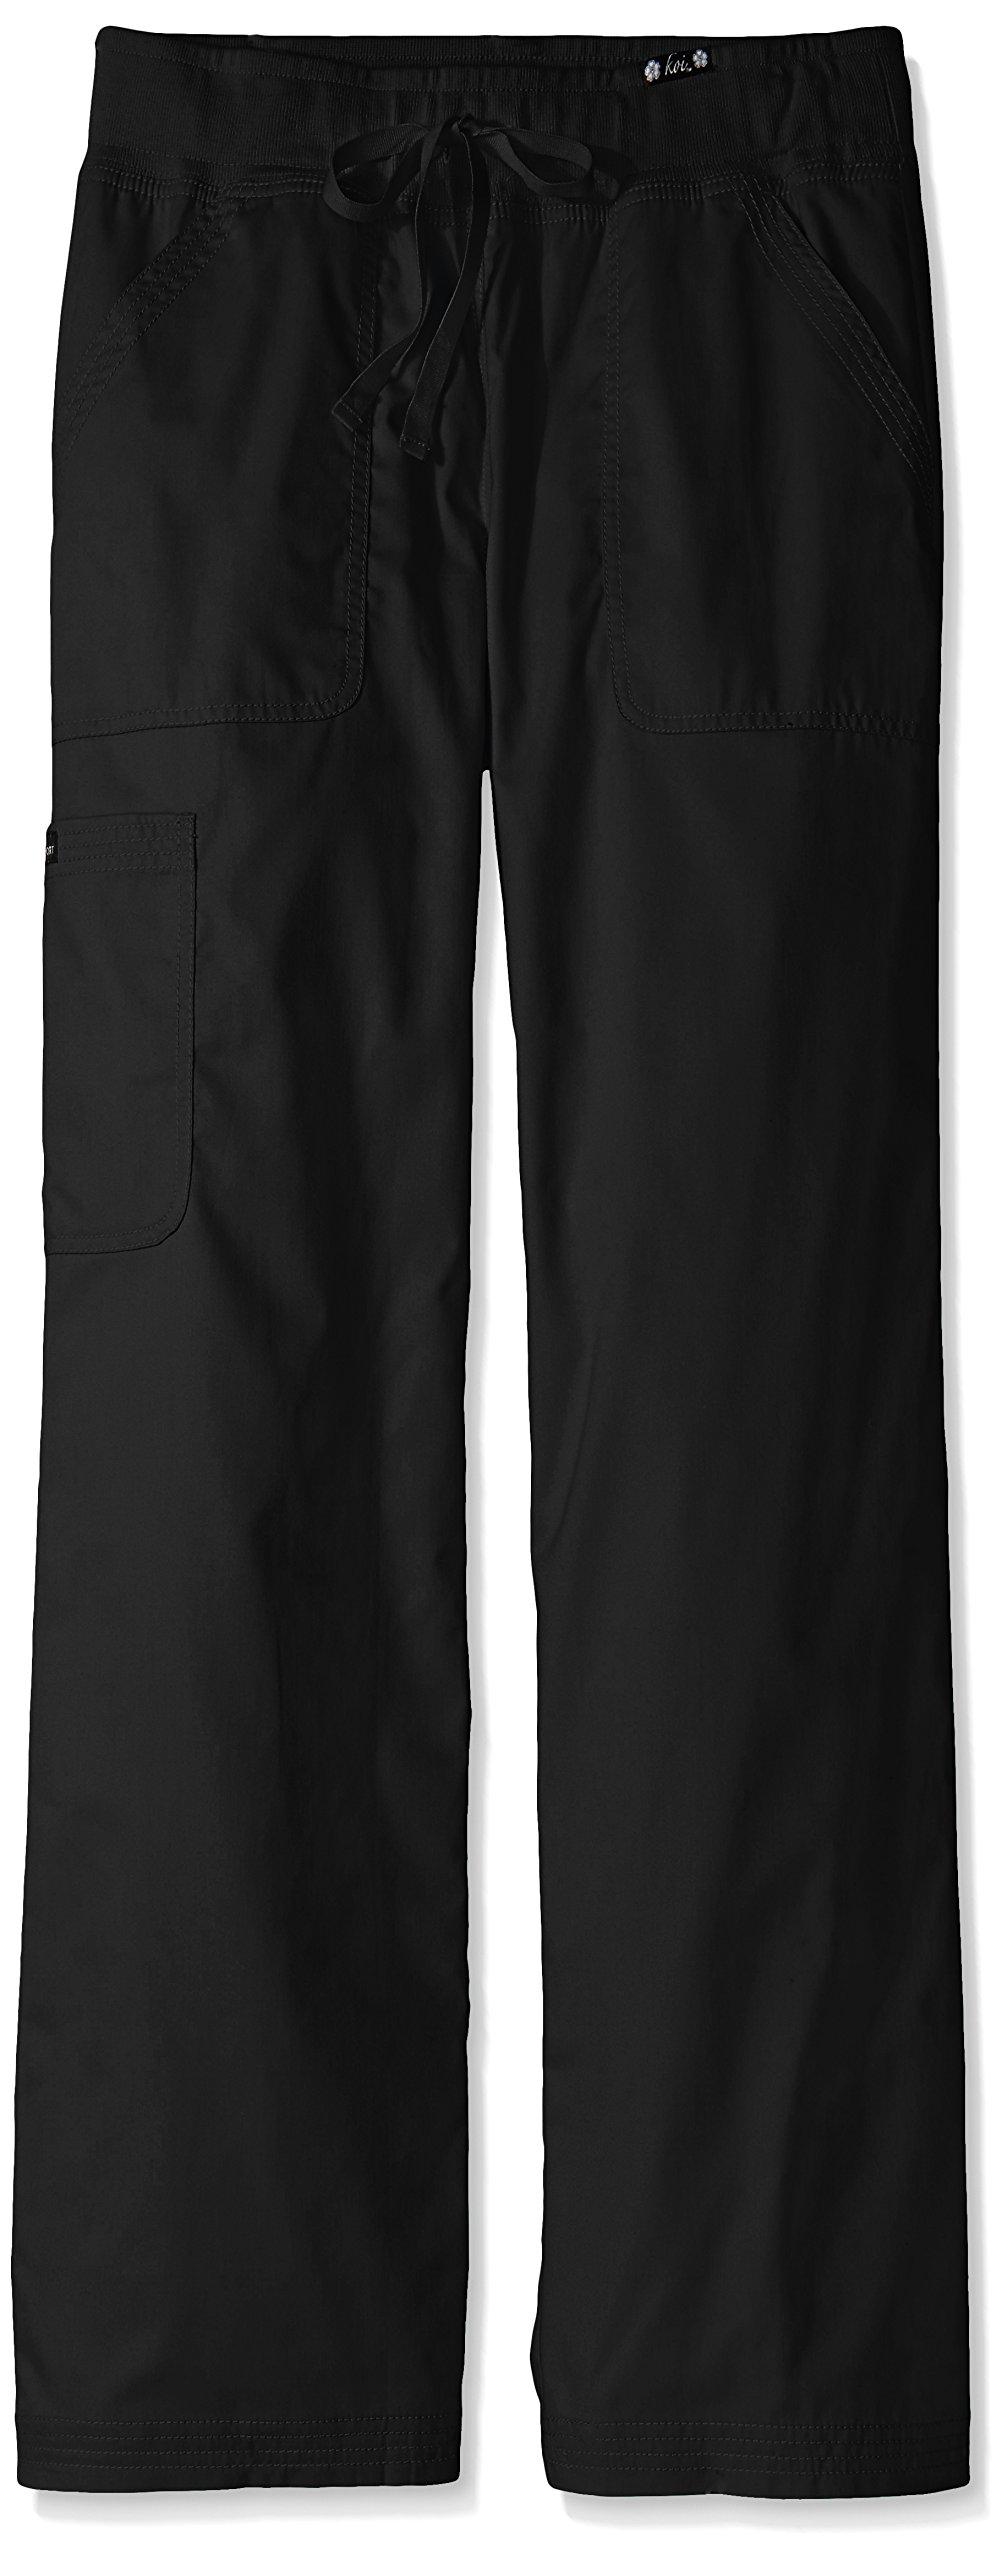 KOI Women's Tall Morgan Ultra Comfy Yoga-Style Cargo Scrub Pants, Black, Medium/Tall